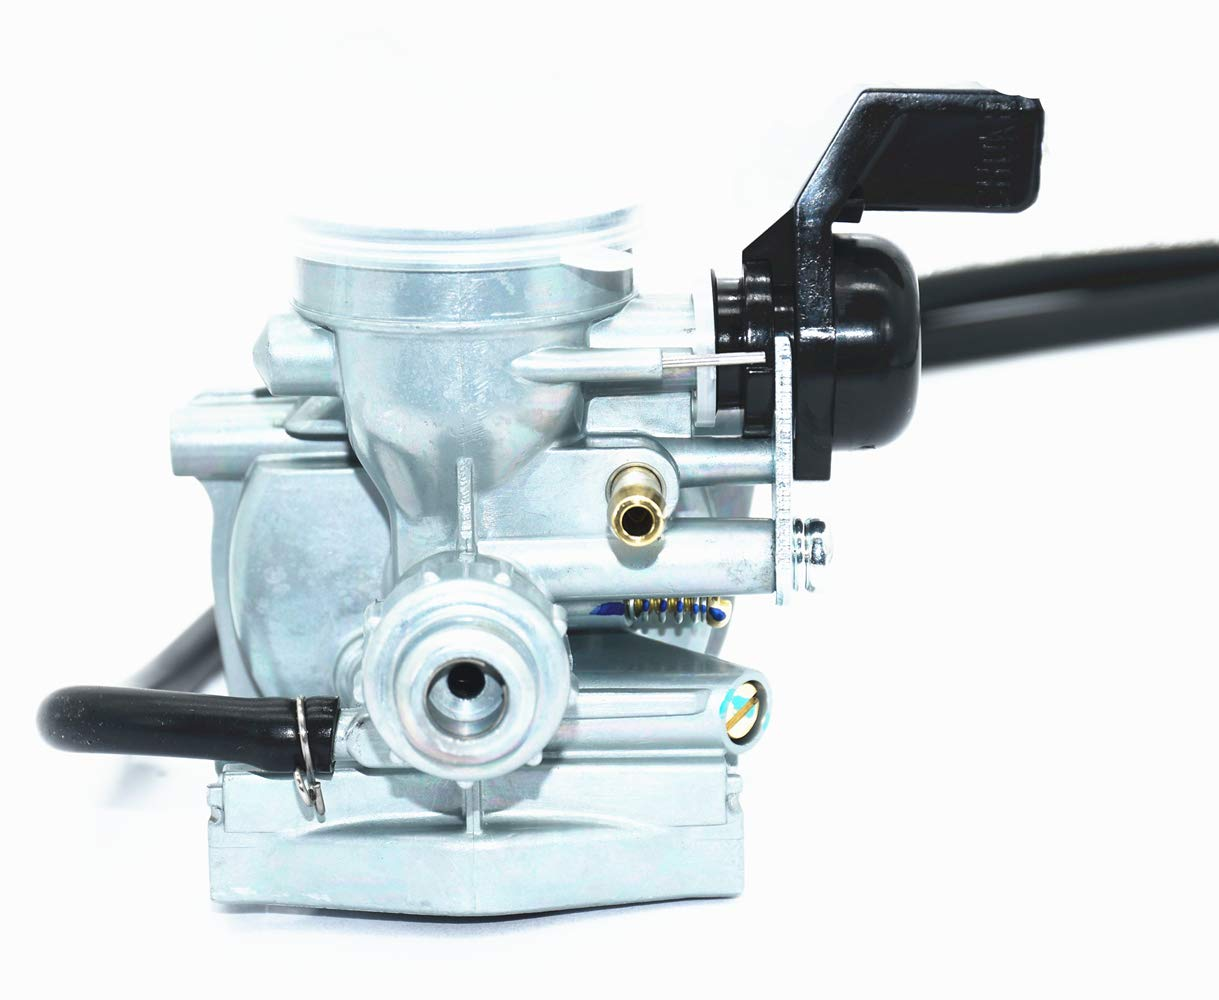 Autu Parts Carburetor For 1997-2004 XR70R CRF70F Carb Assembly 16100-GCF-672